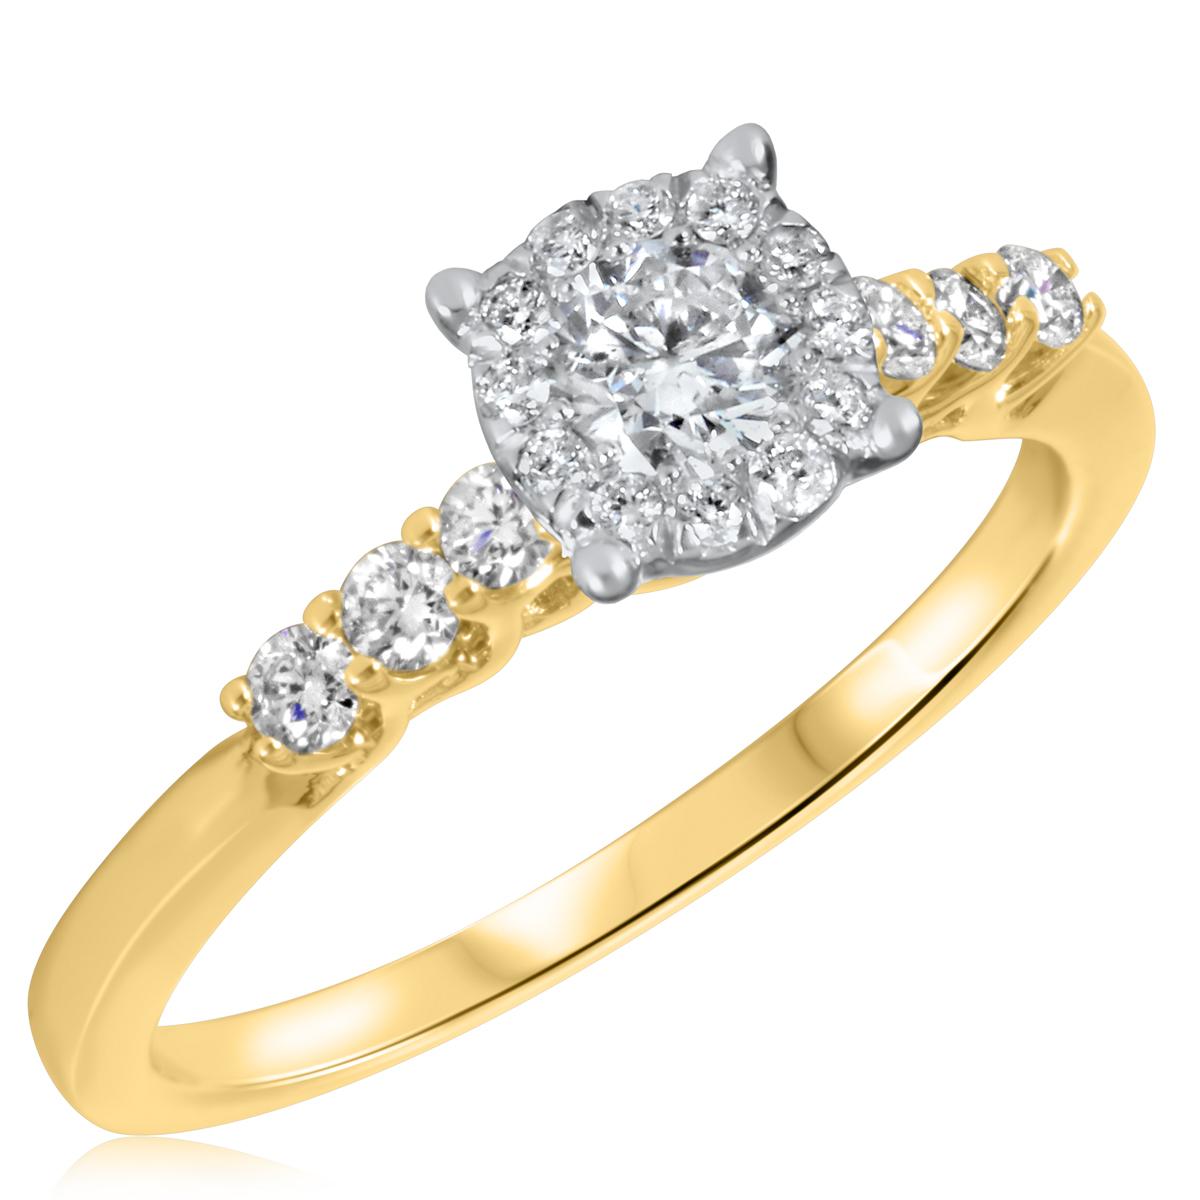 5/8 CT. T.W. Diamond Ladies Engagement Ring 14K Yellow Gold- Size 8